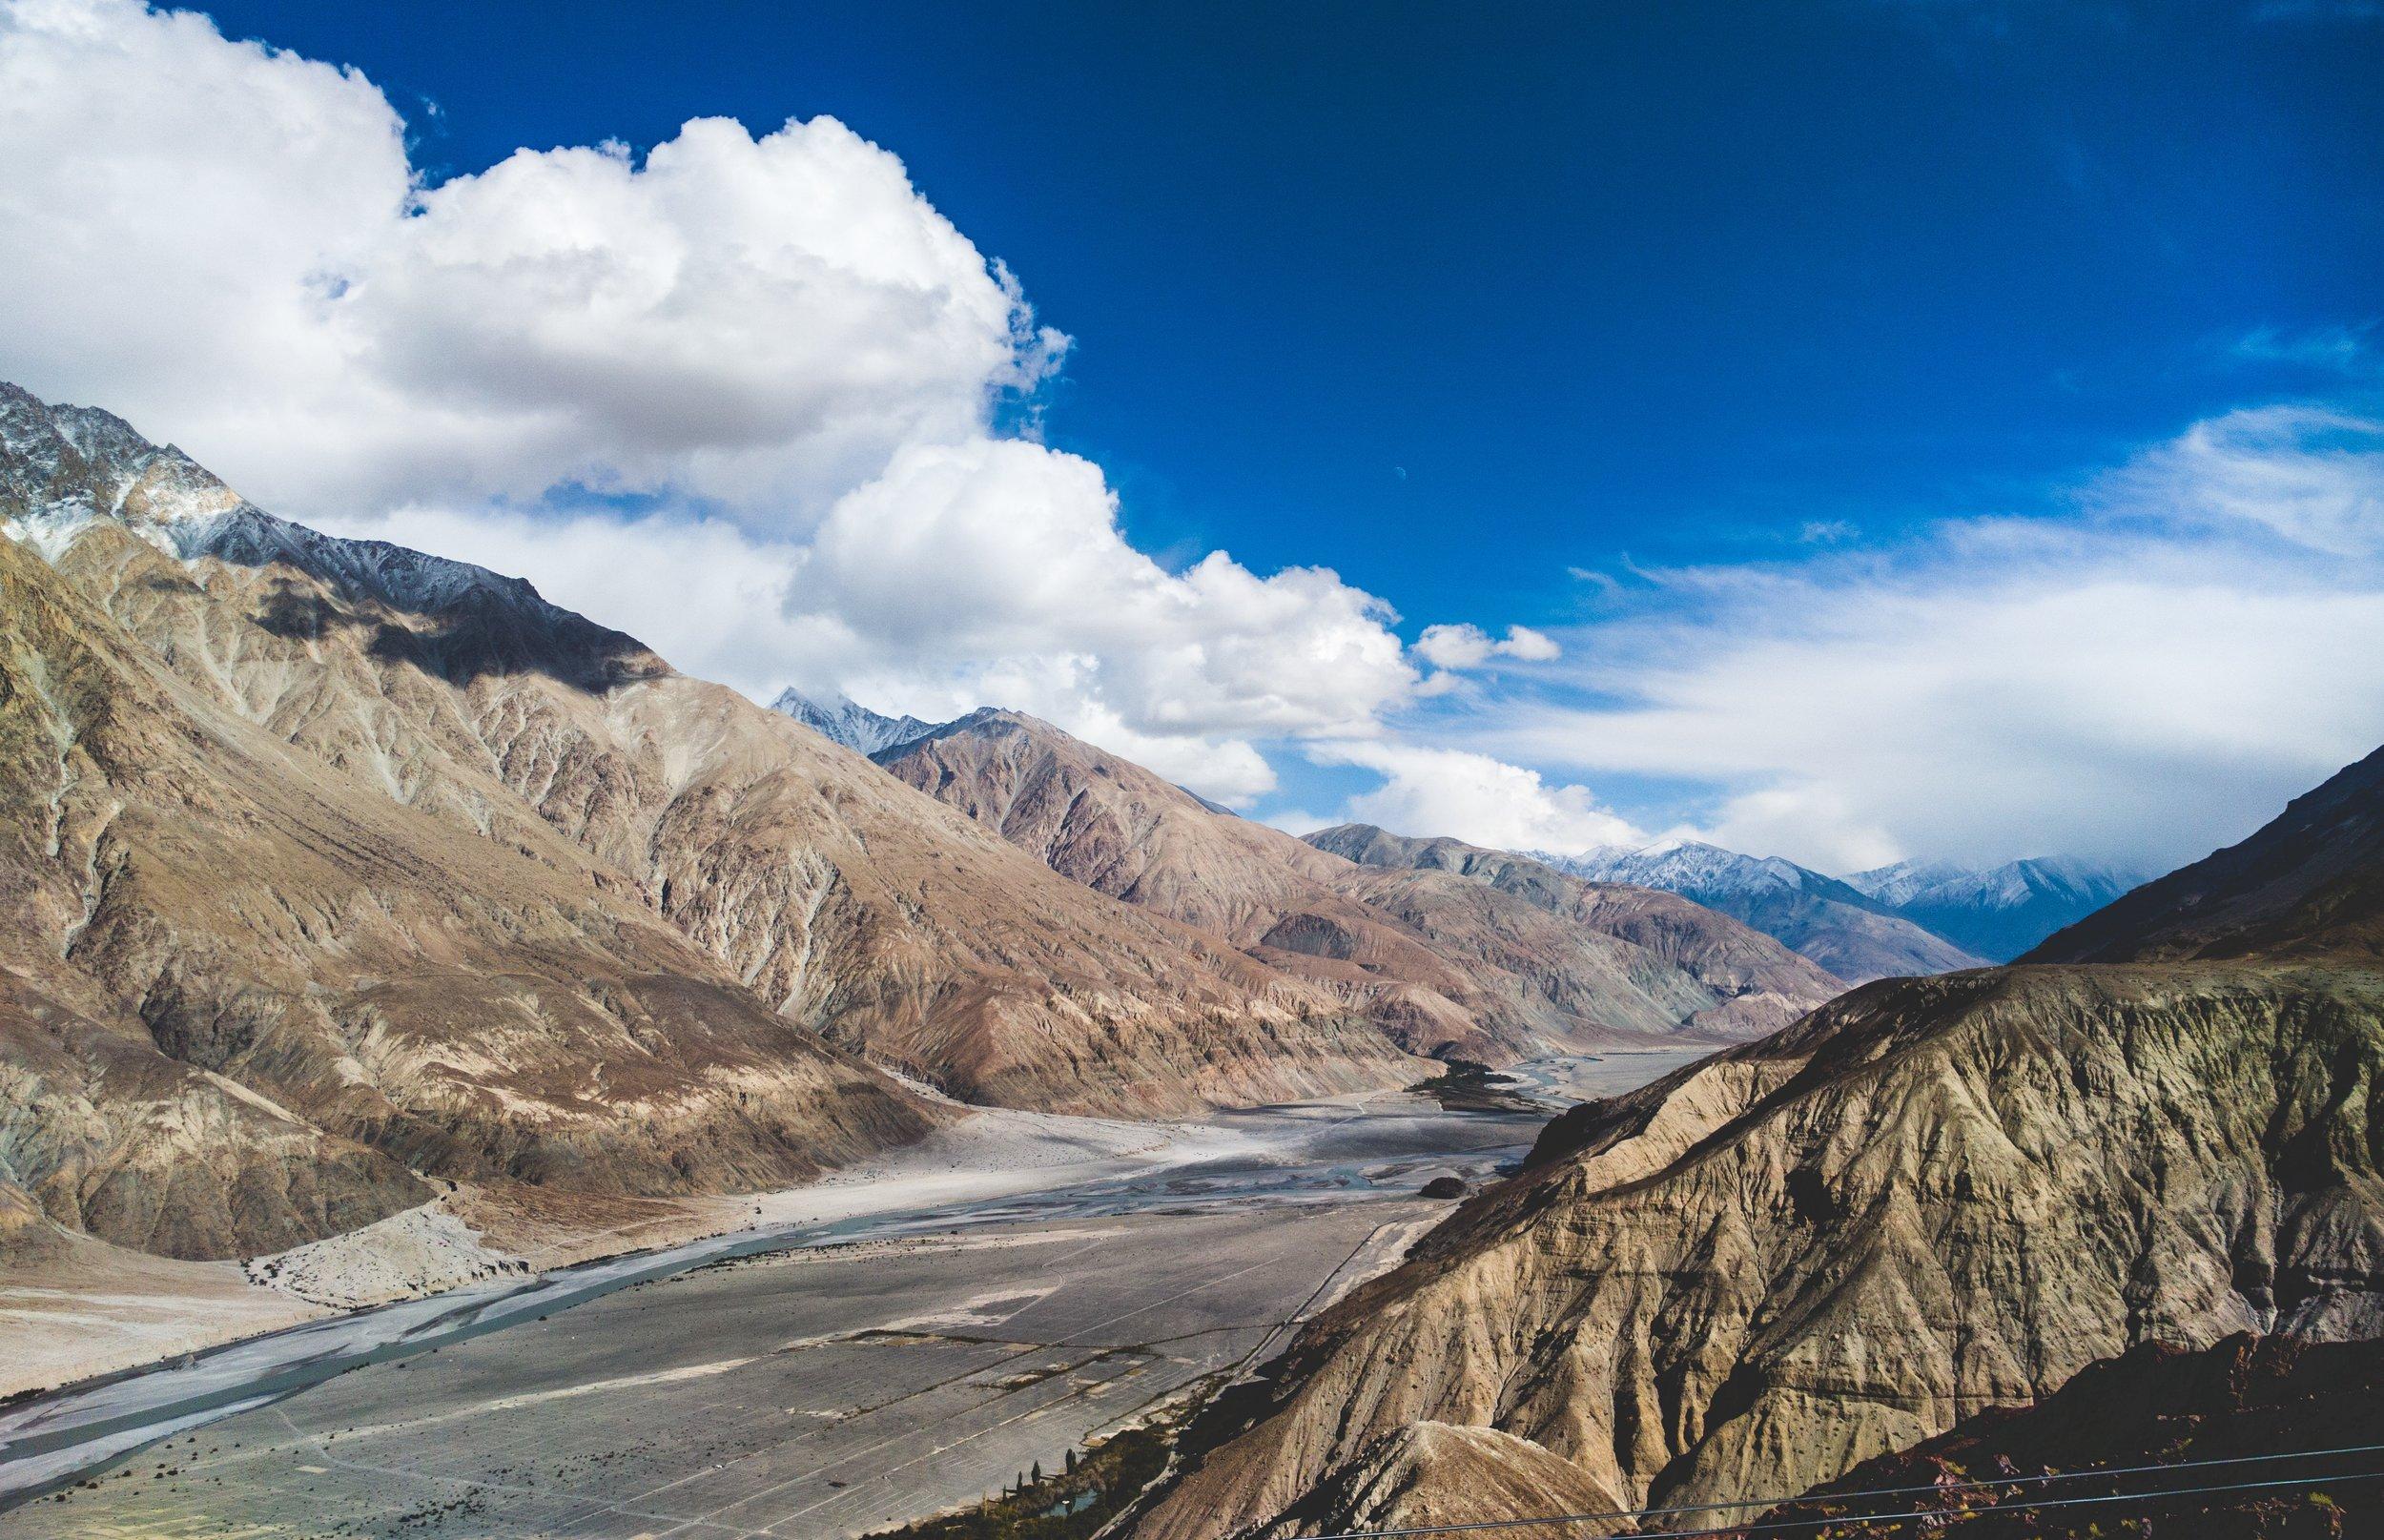 Nubra Valley by Abdullah Alam